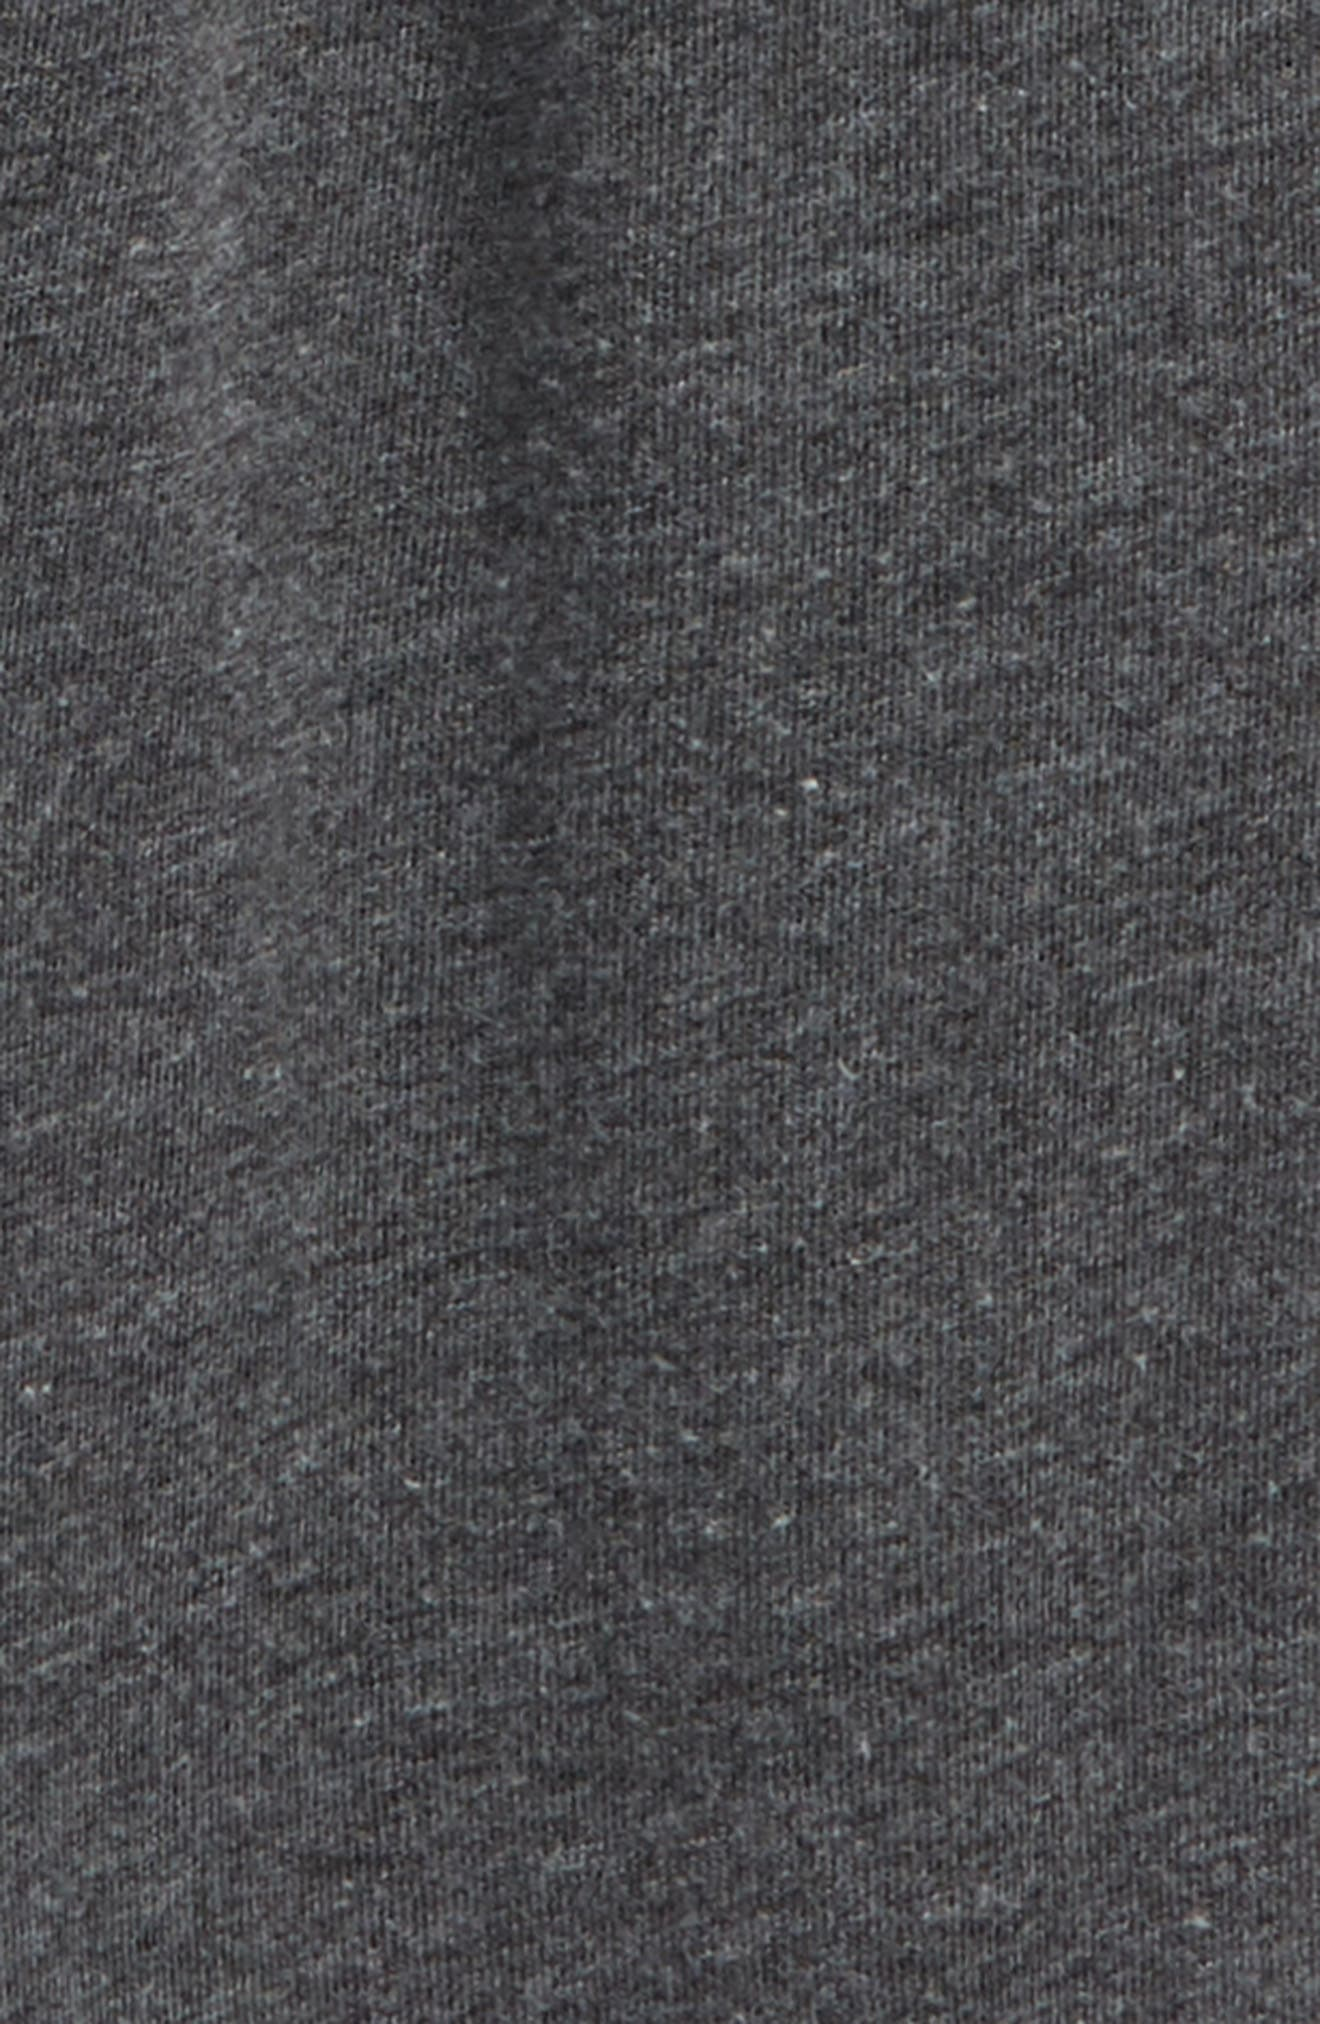 Burnout Harem Pants,                             Alternate thumbnail 2, color,                             BLACK